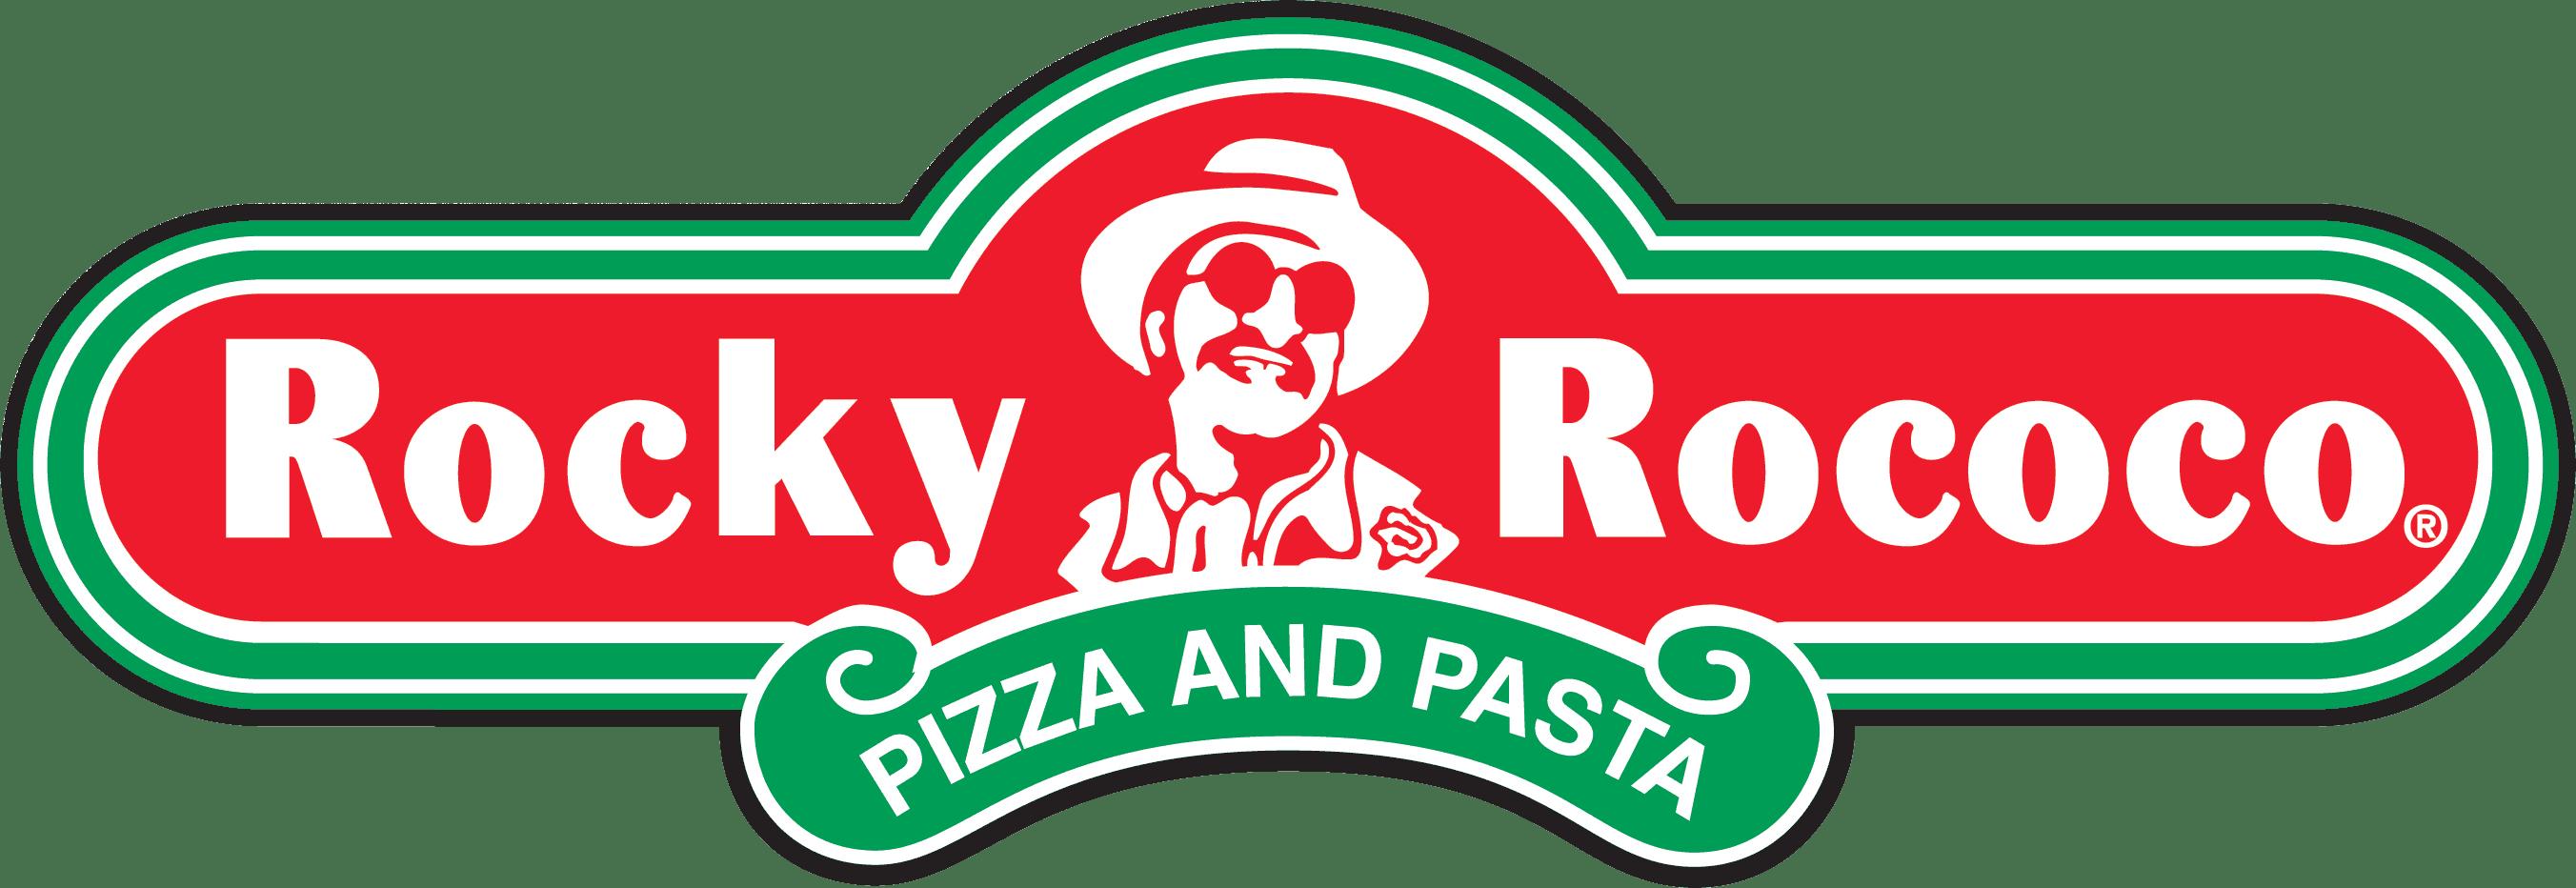 Rocky Rococo - Whitewater Logo